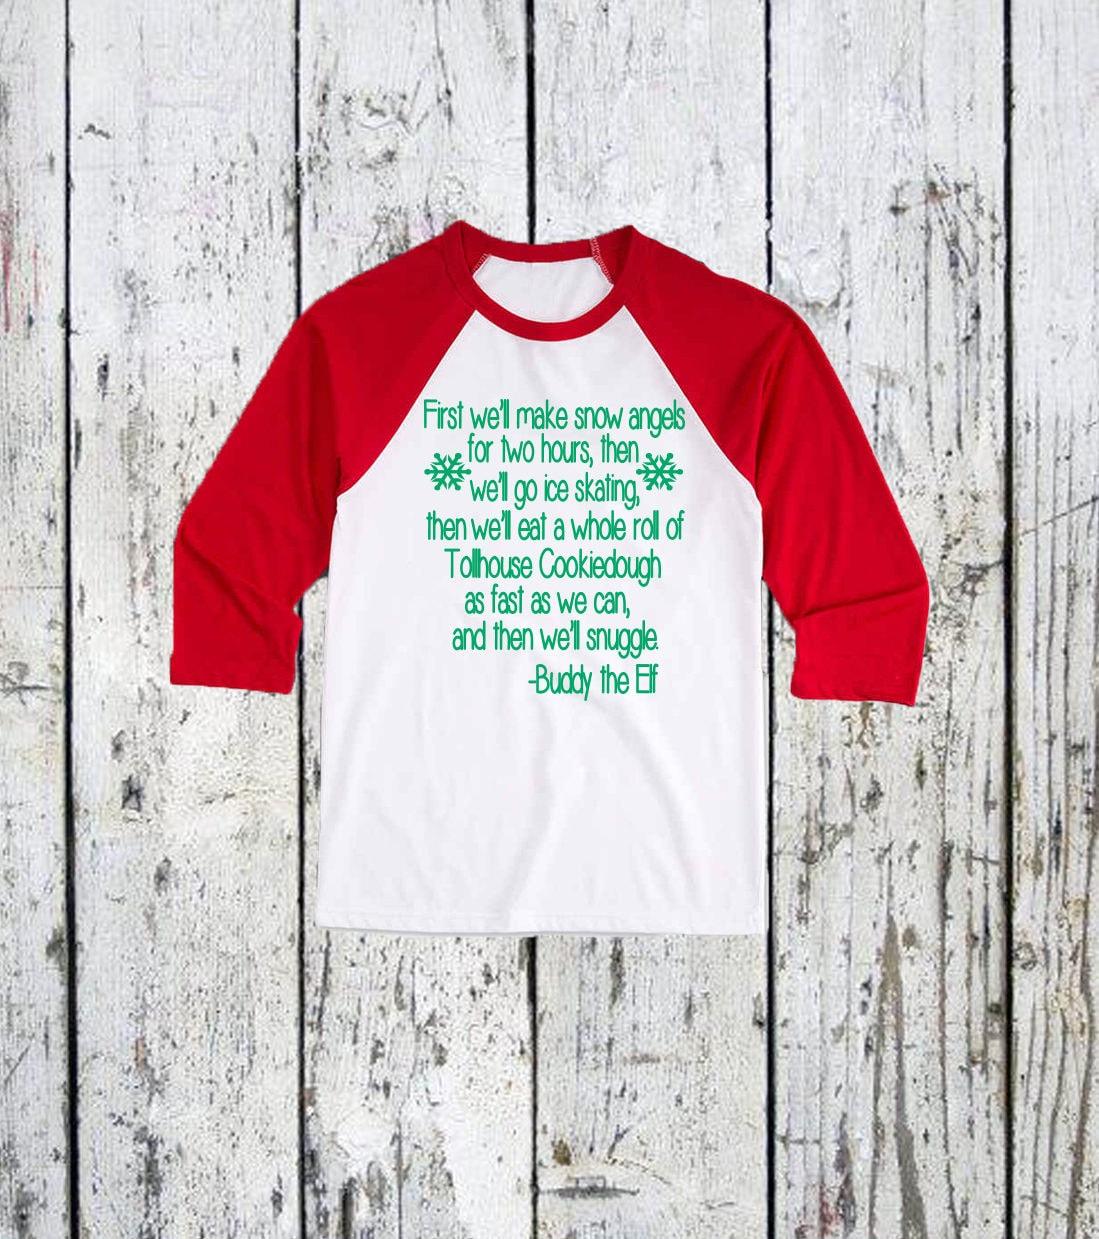 Jugend Kumpel Elf Weihnachten T-Shirt. Kinder Weihnachten | Etsy